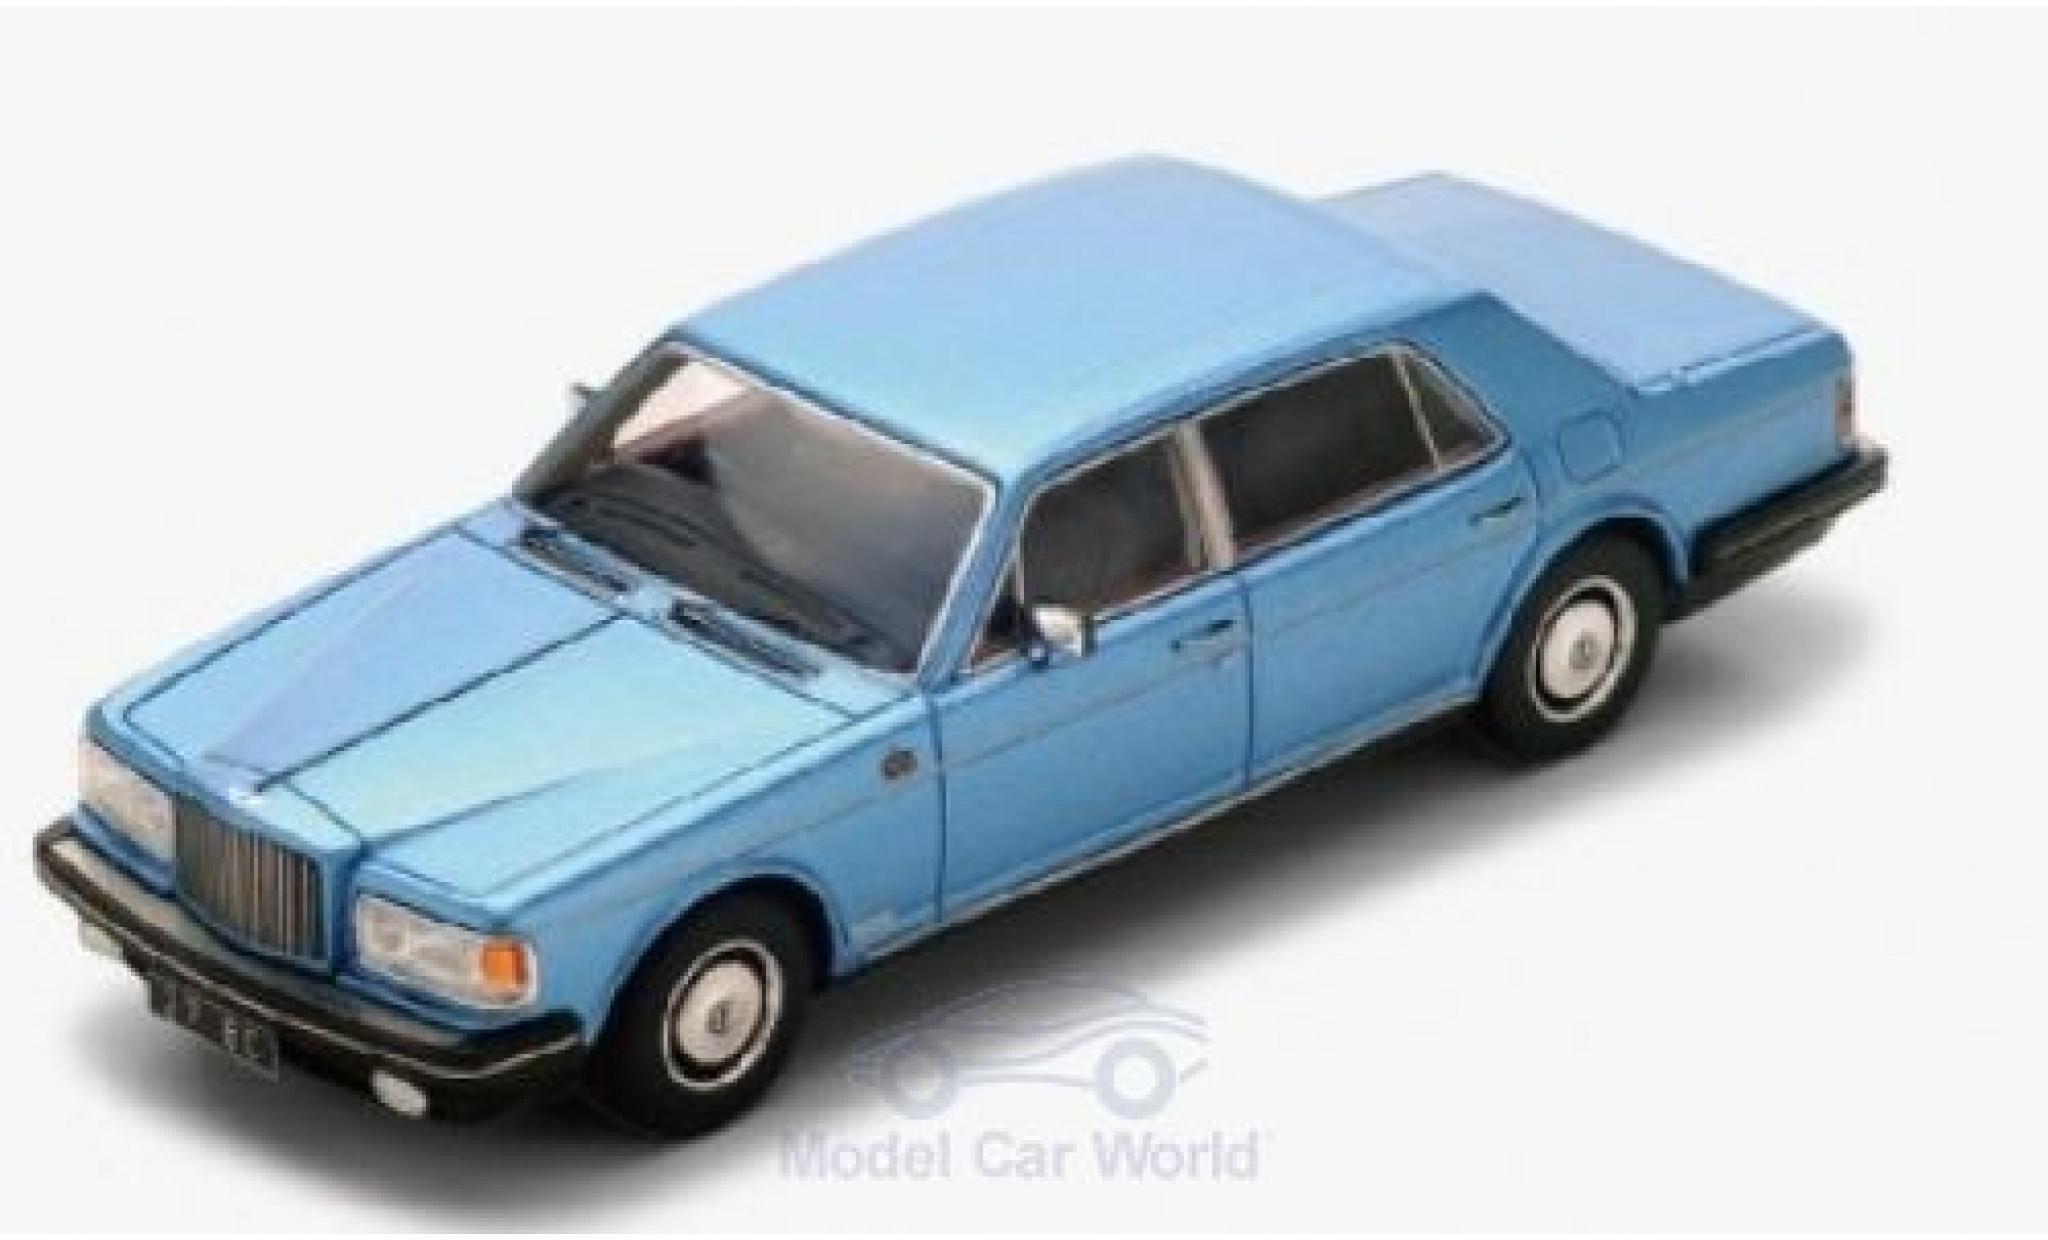 Bentley Mulsanne 1/43 Spark metallise blu RHD 1980